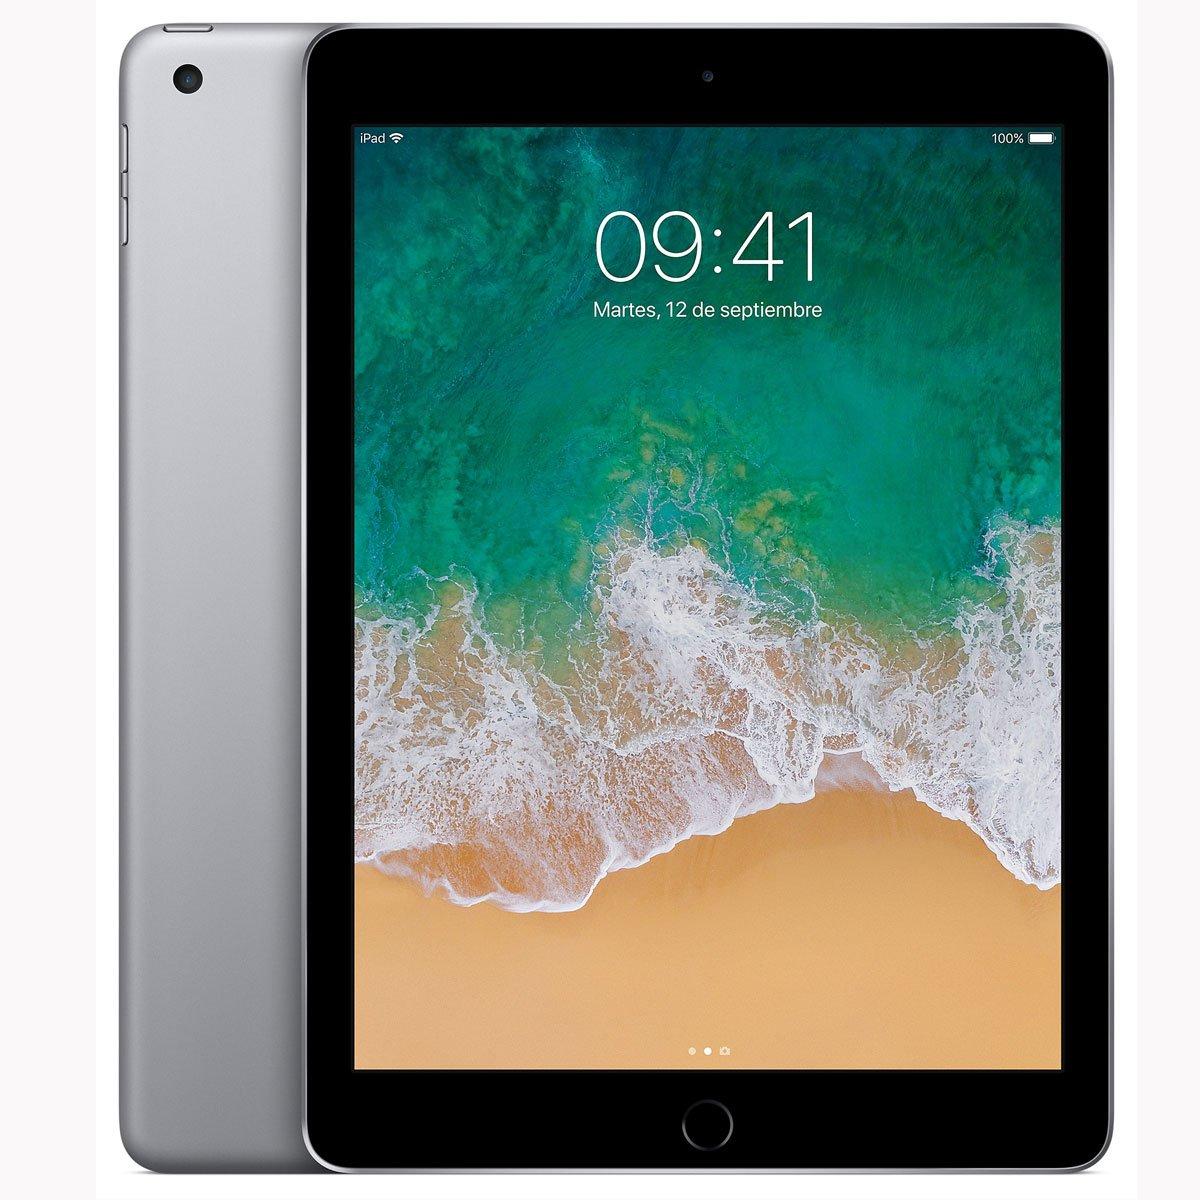 iPad 9.7 Wi-Fi 128GB space Grey MP2H2CL/A | SEARS.COM.MX - Me entiende!